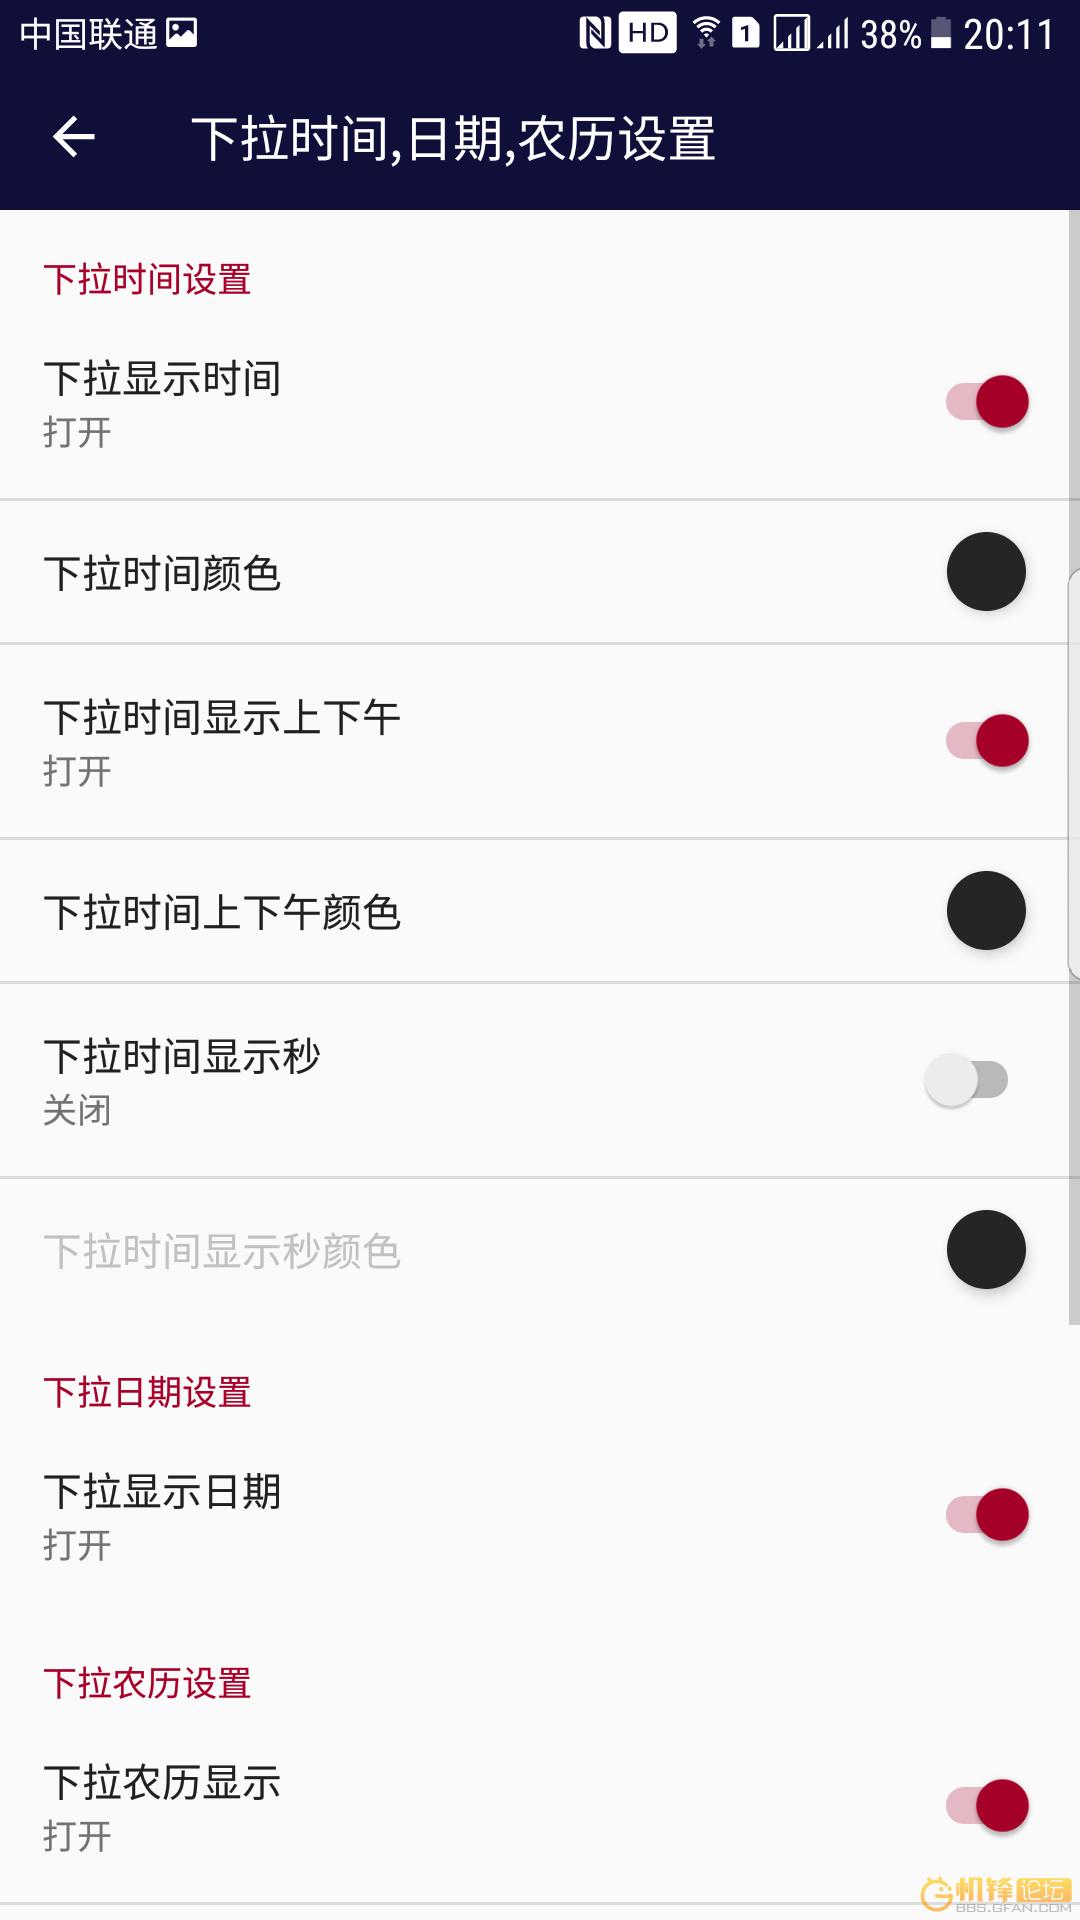 Screenshot_20180124-201148.png